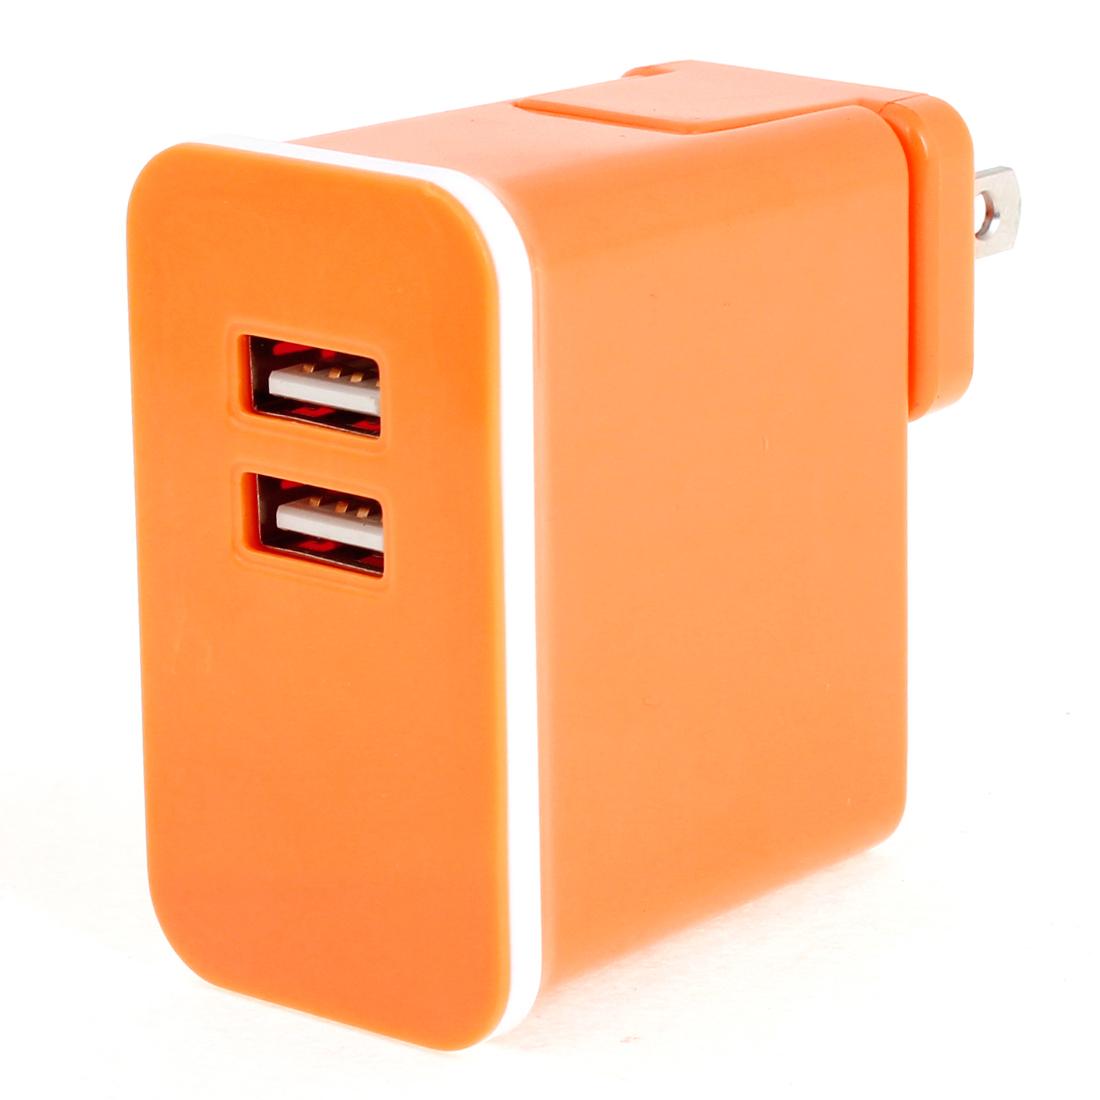 Orange Plastic Shell 2 USB Ports AC Power Adapter Travel Charger US Plug